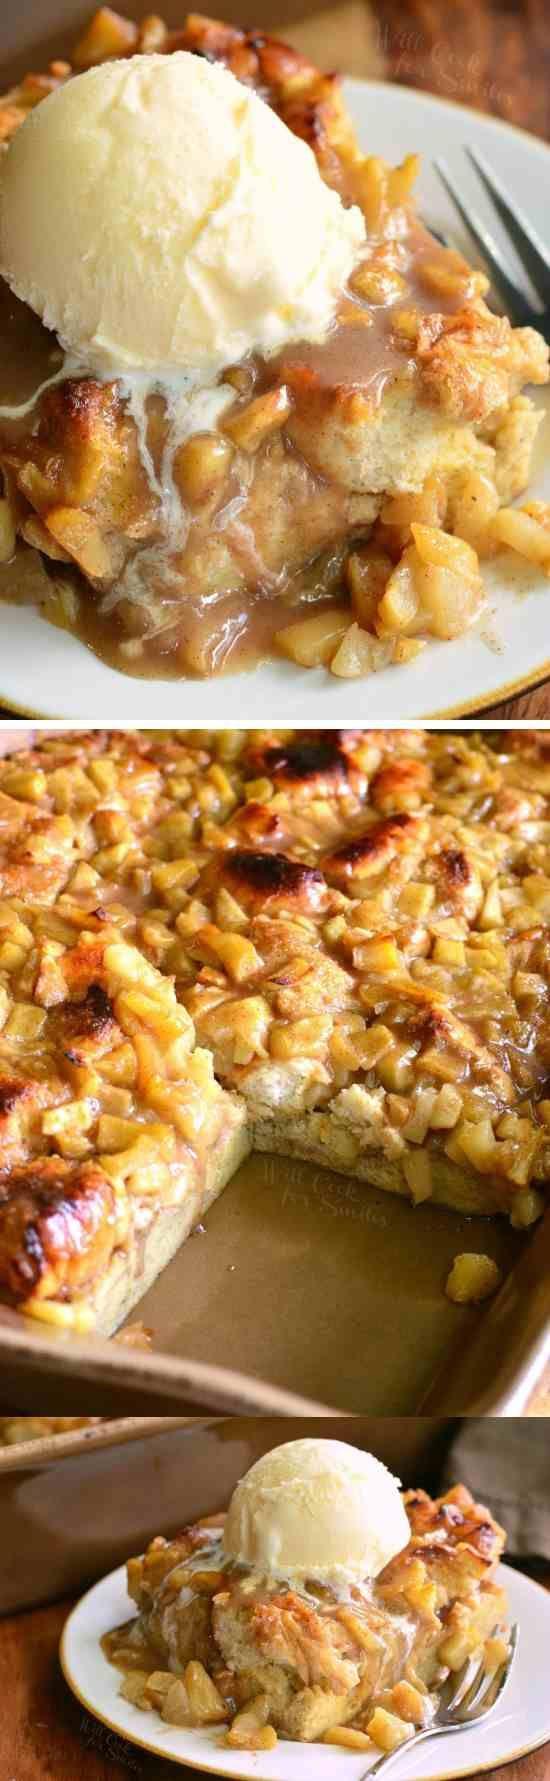 Apple Pie Bread Pudding - apple, bread, cinnamon, dessert, ice cream, pie, pudding, recipes